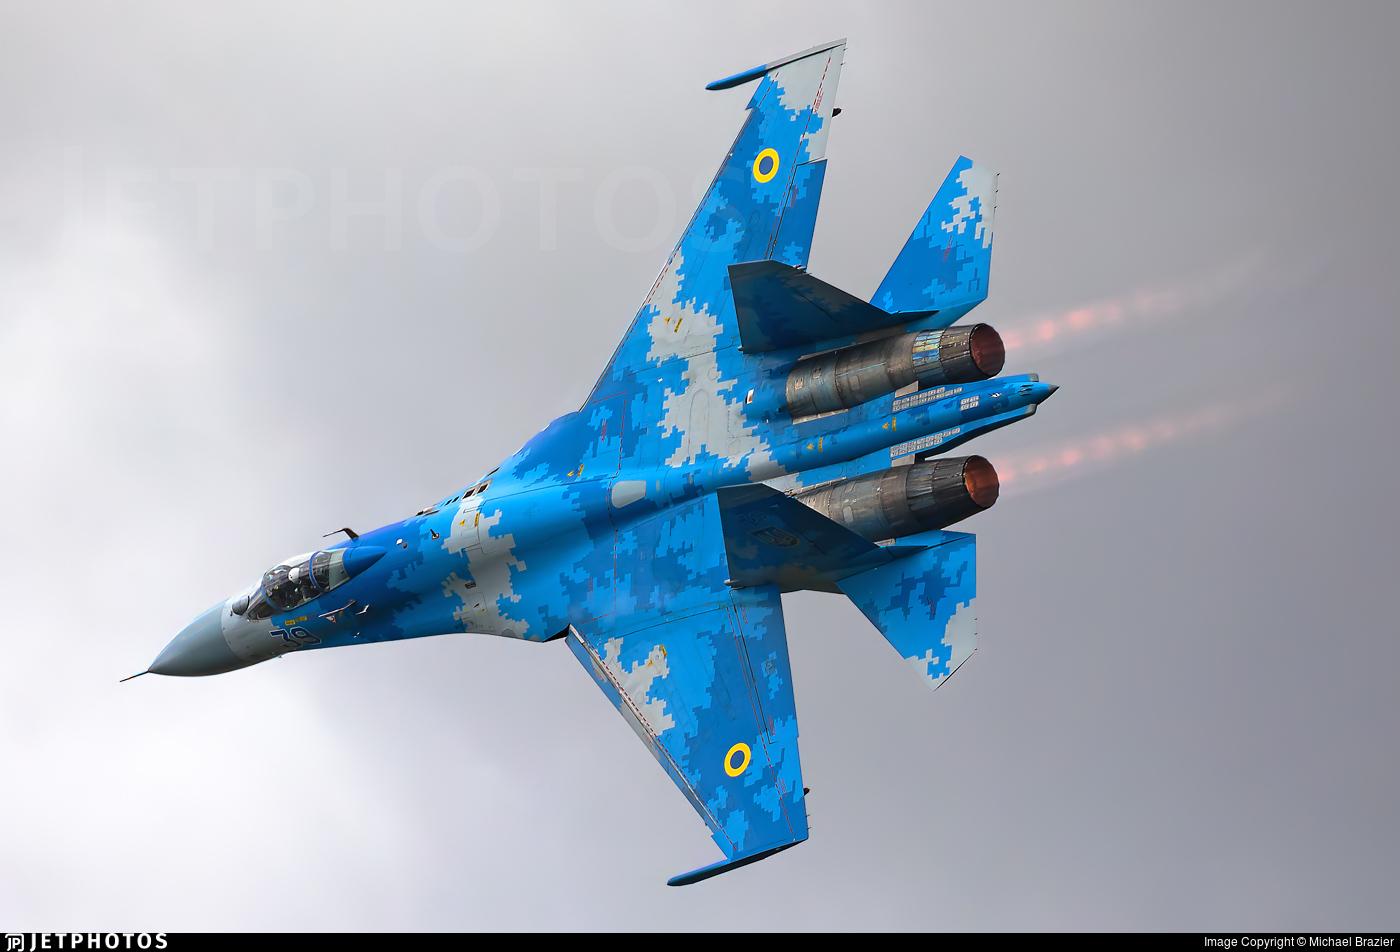 39 - Sukhoi Su-27P Flanker - Ukraine - Air Force